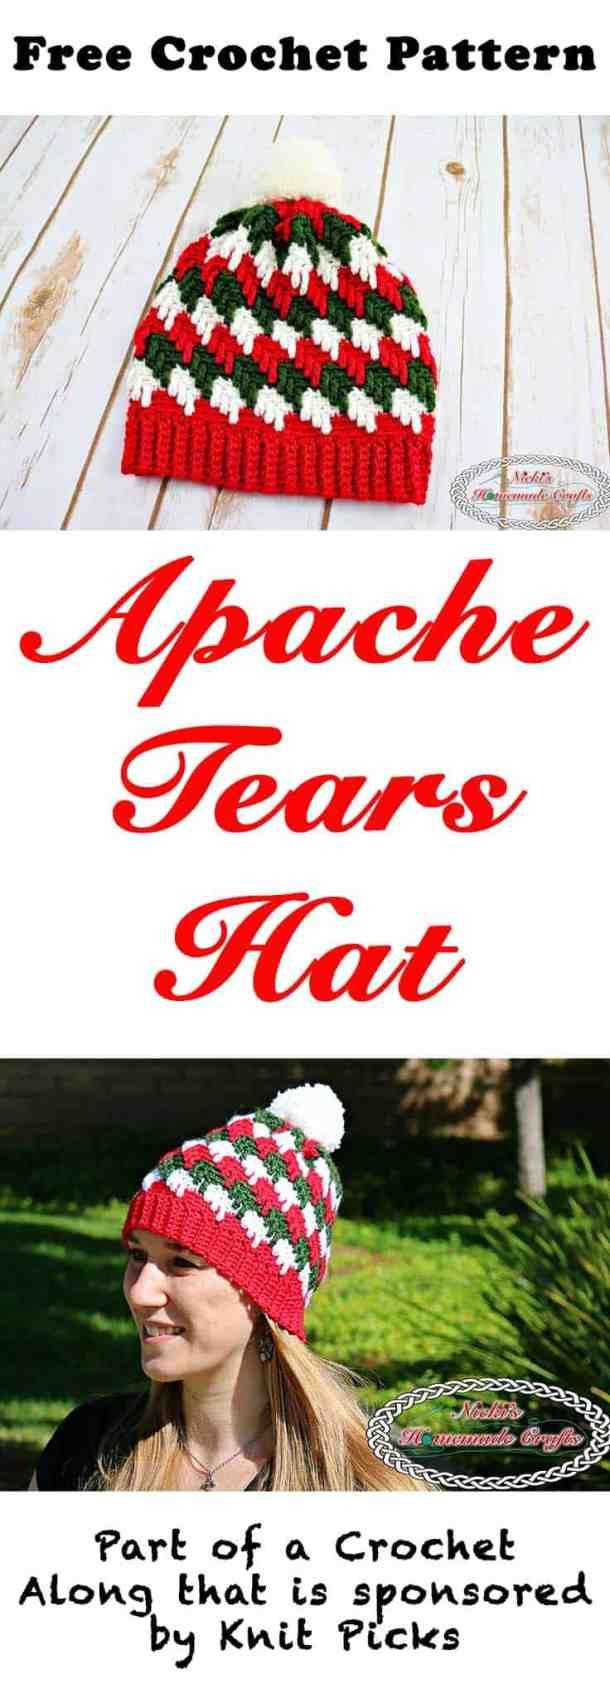 Apache Tears Hat - Free Crochet Pattern - Crochet Along by Nicki's Homemade Crafts #crochet #freecrochetpattern #hat #apachetears #crochetalong #knitpicks